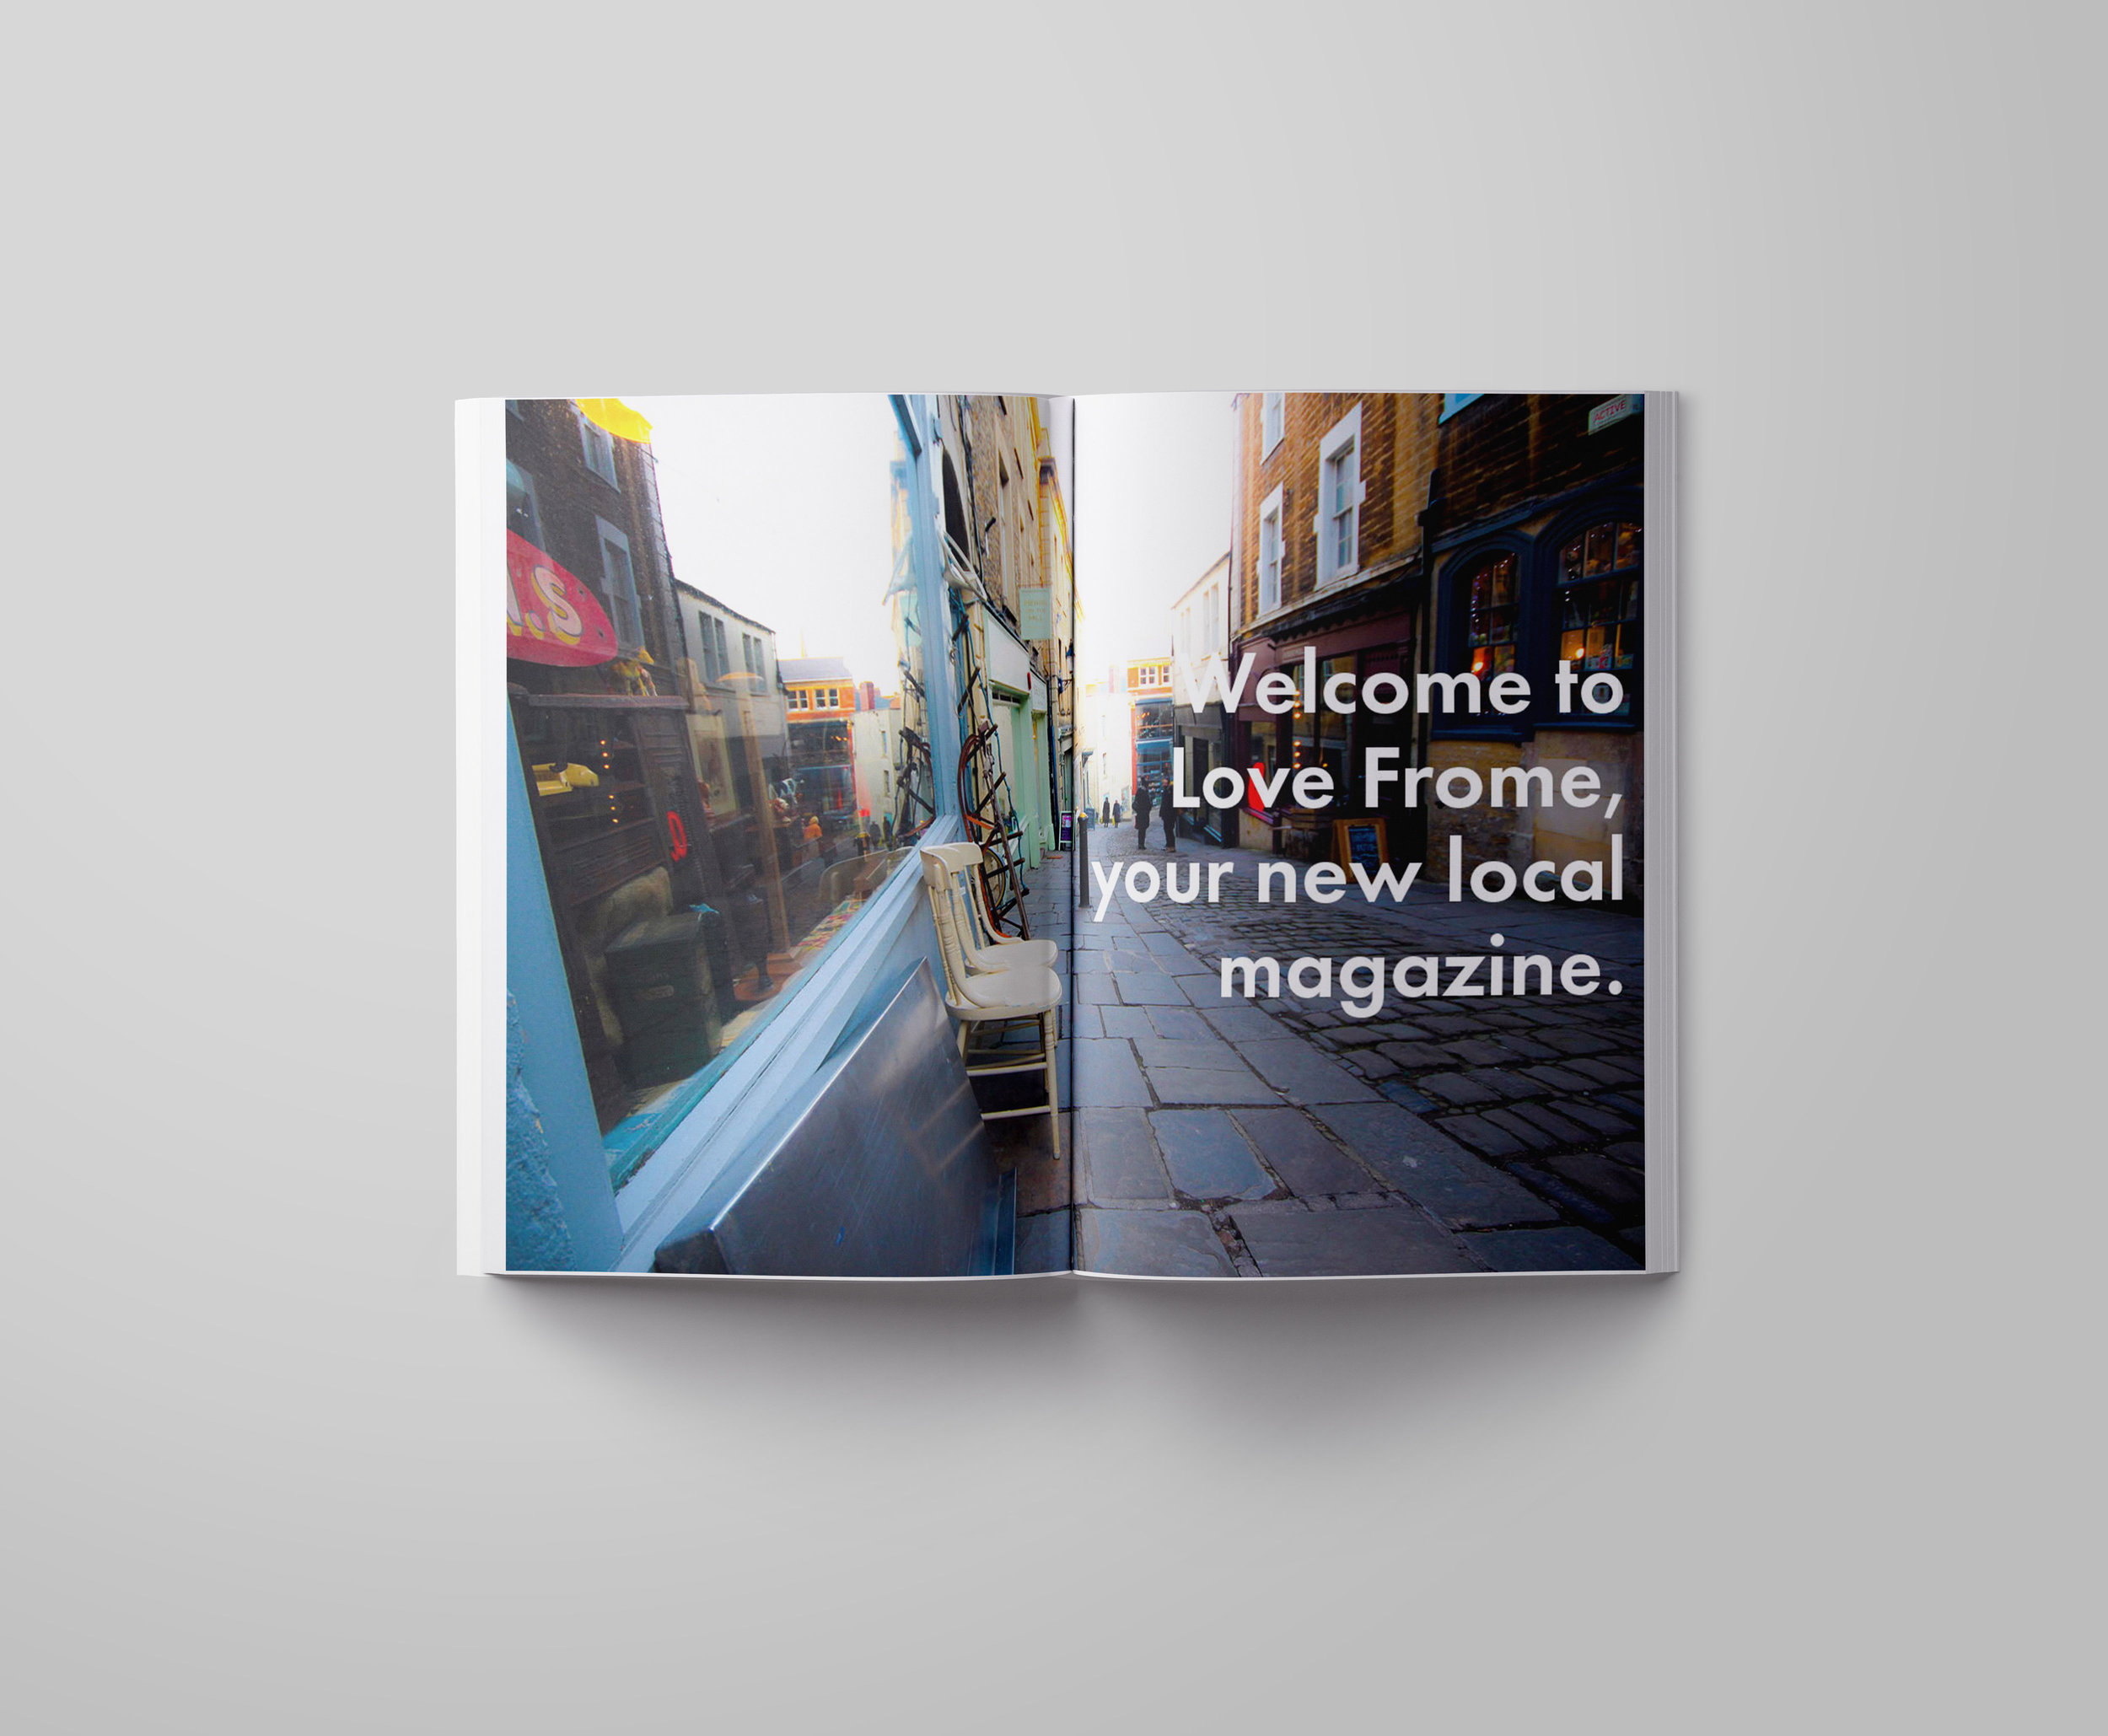 5-Graphic-Design-Print-Frome-Somerset-London-StokeNewington-Devon.jpg.jpg